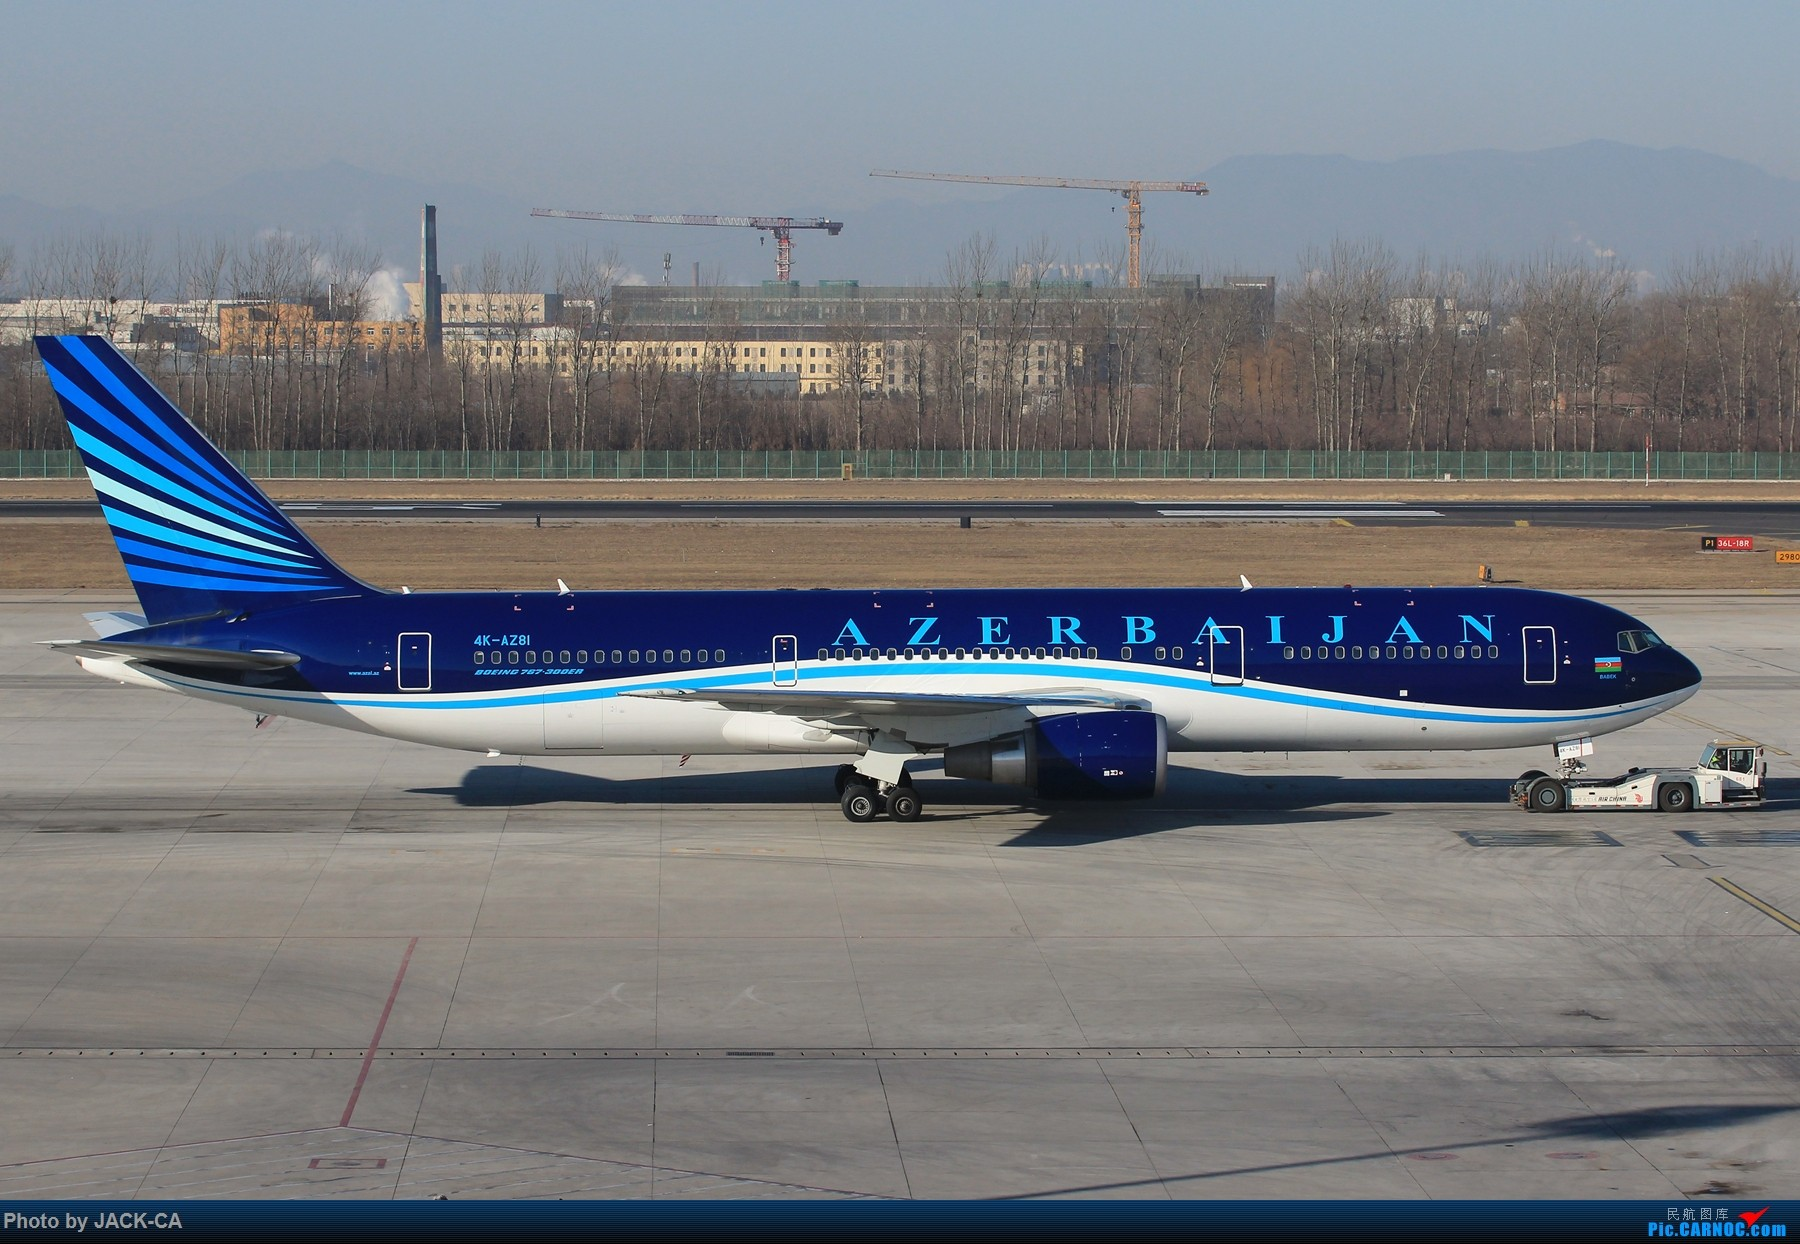 Re:[原创]【组图】北京拍机之苏活视角 BOEING 767-300ER 4K-AZ81 中国北京首都国际机场